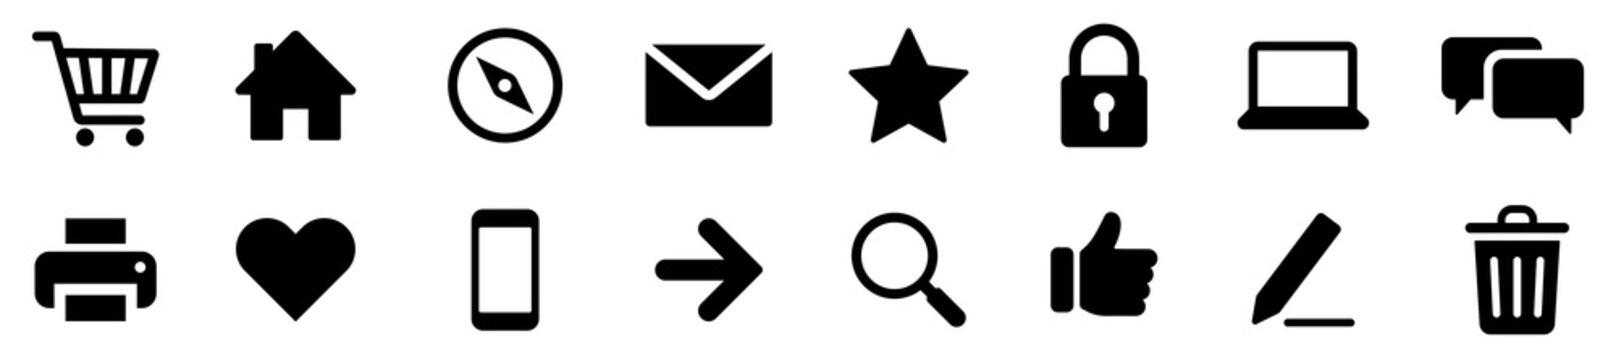 Web icon set isolated on white background. Vector